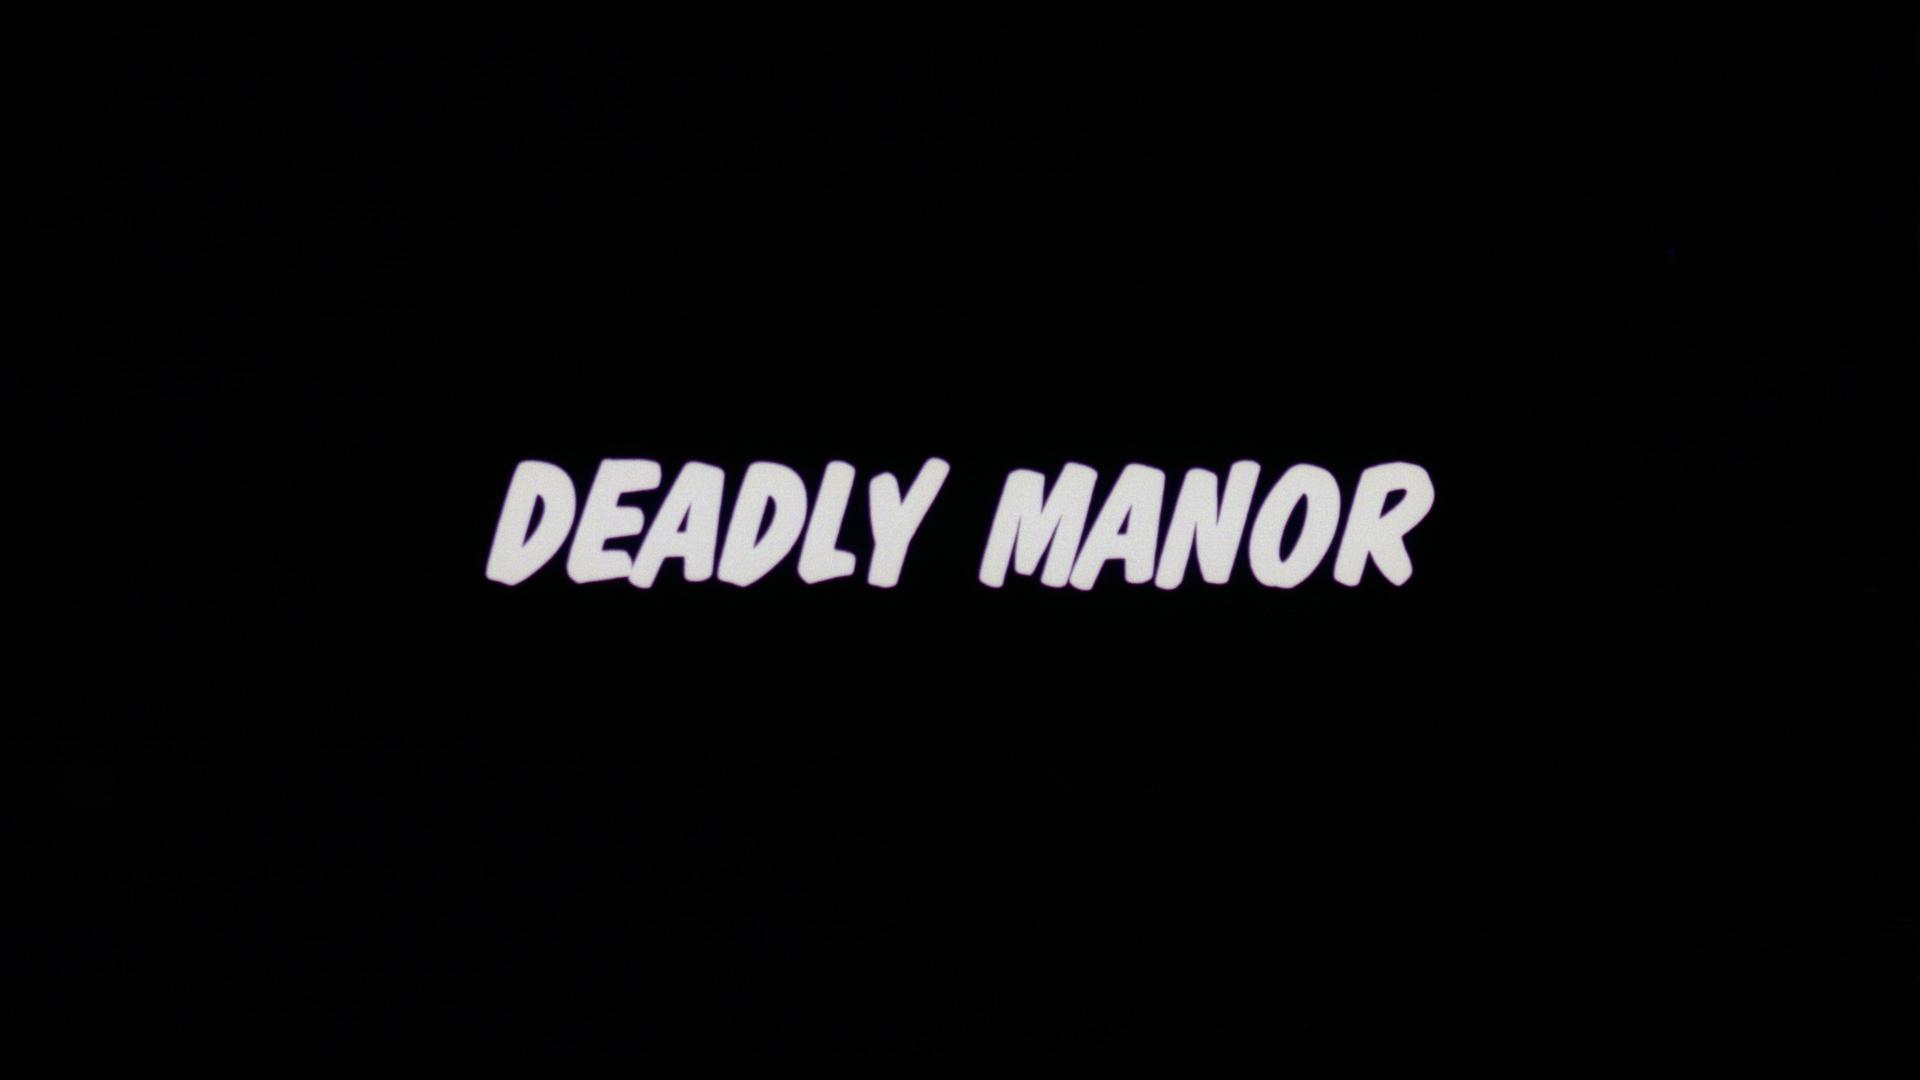 deadly manor 2020 arrow films title